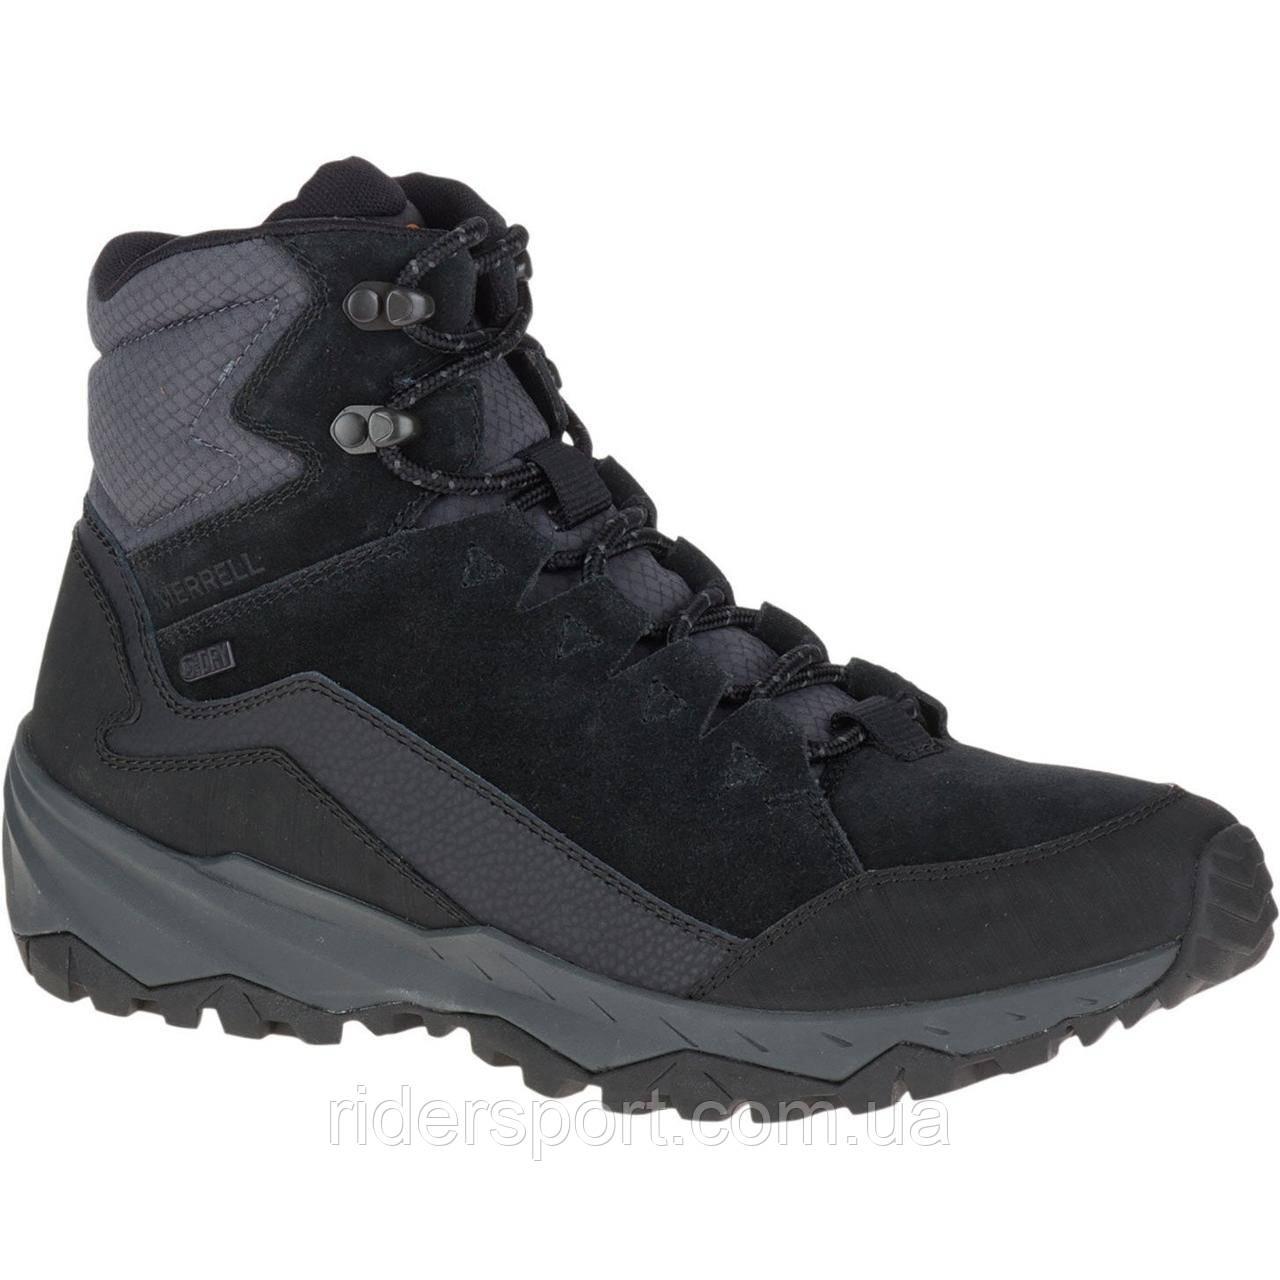 43b38b23 Ботинки мужские MERRELL Mid Polar Wp J95049 Black: продажа, цена в ...